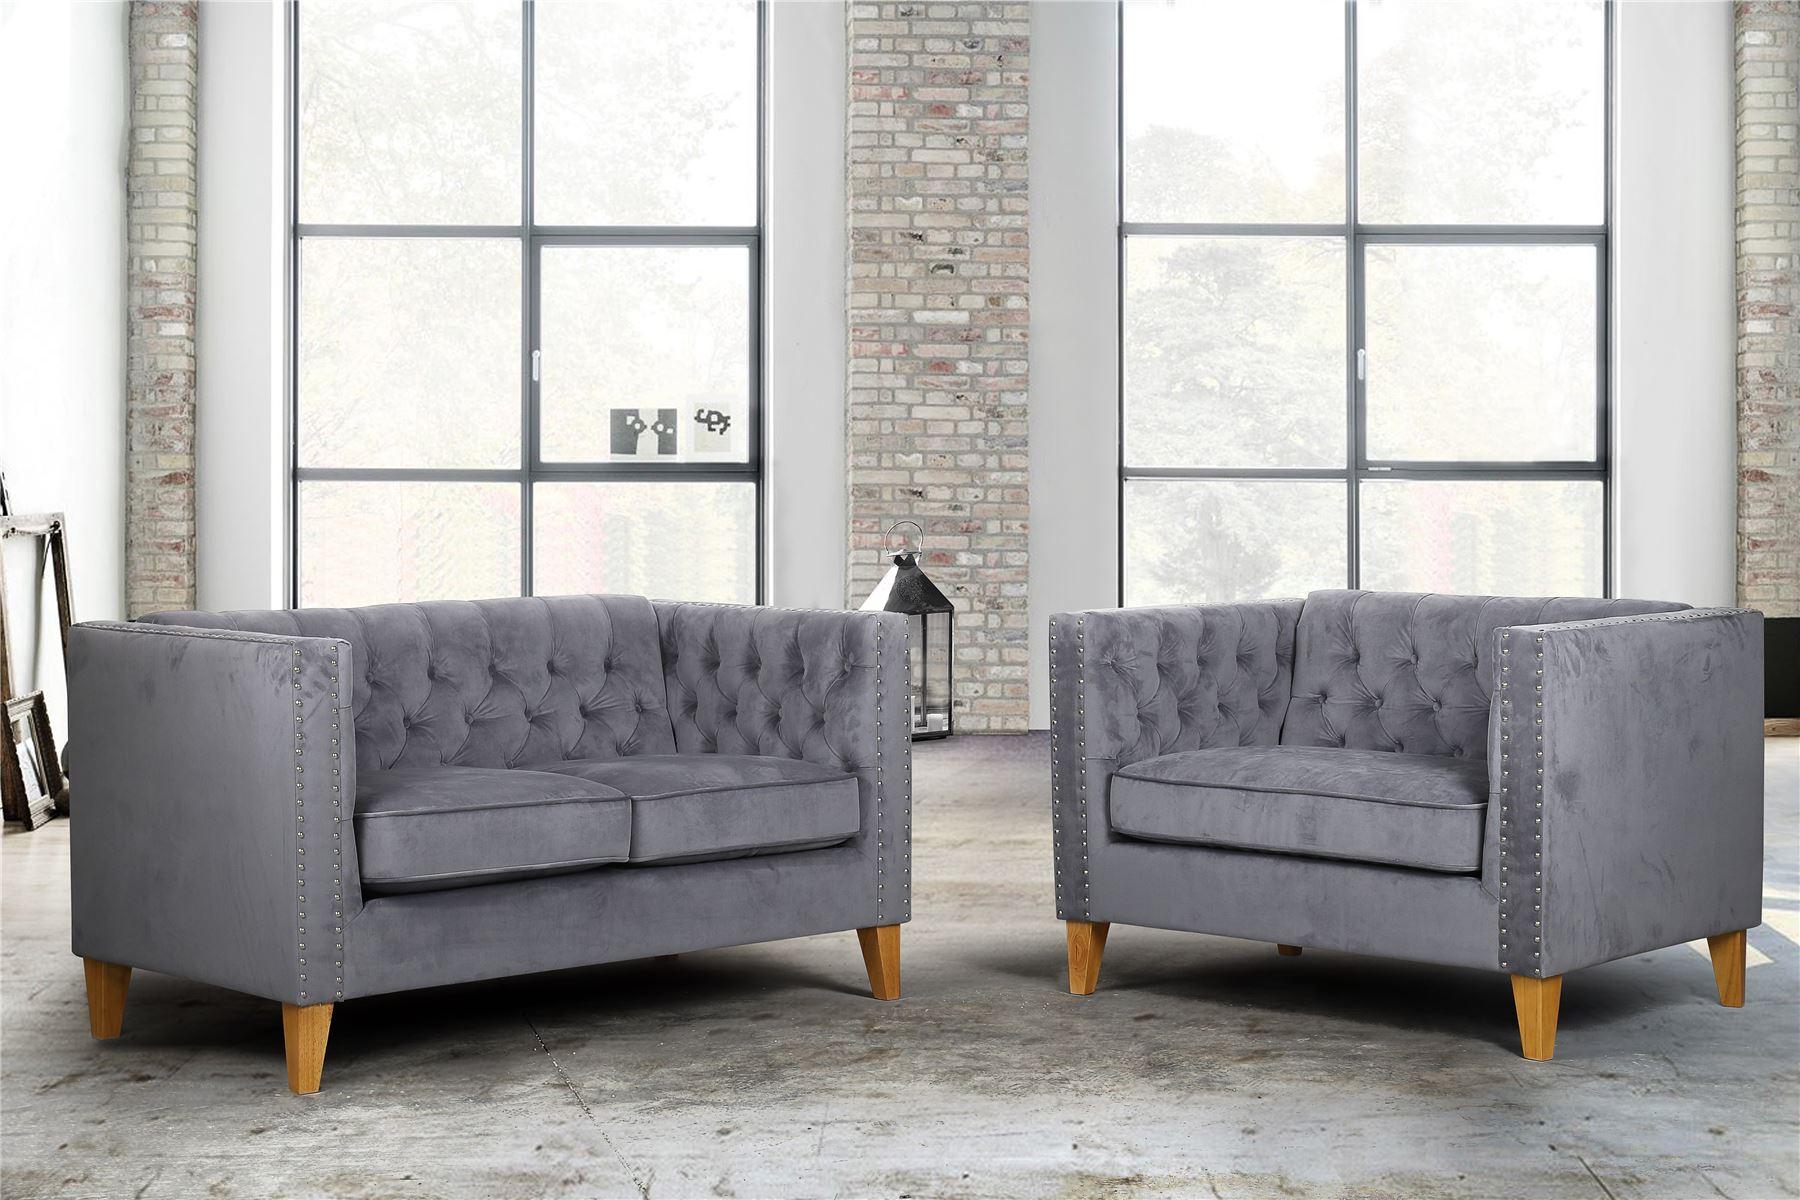 Birlea Florence Grey Velvet Medium Sofa Chair Button Back Within Florence Medium Sofas (View 6 of 15)